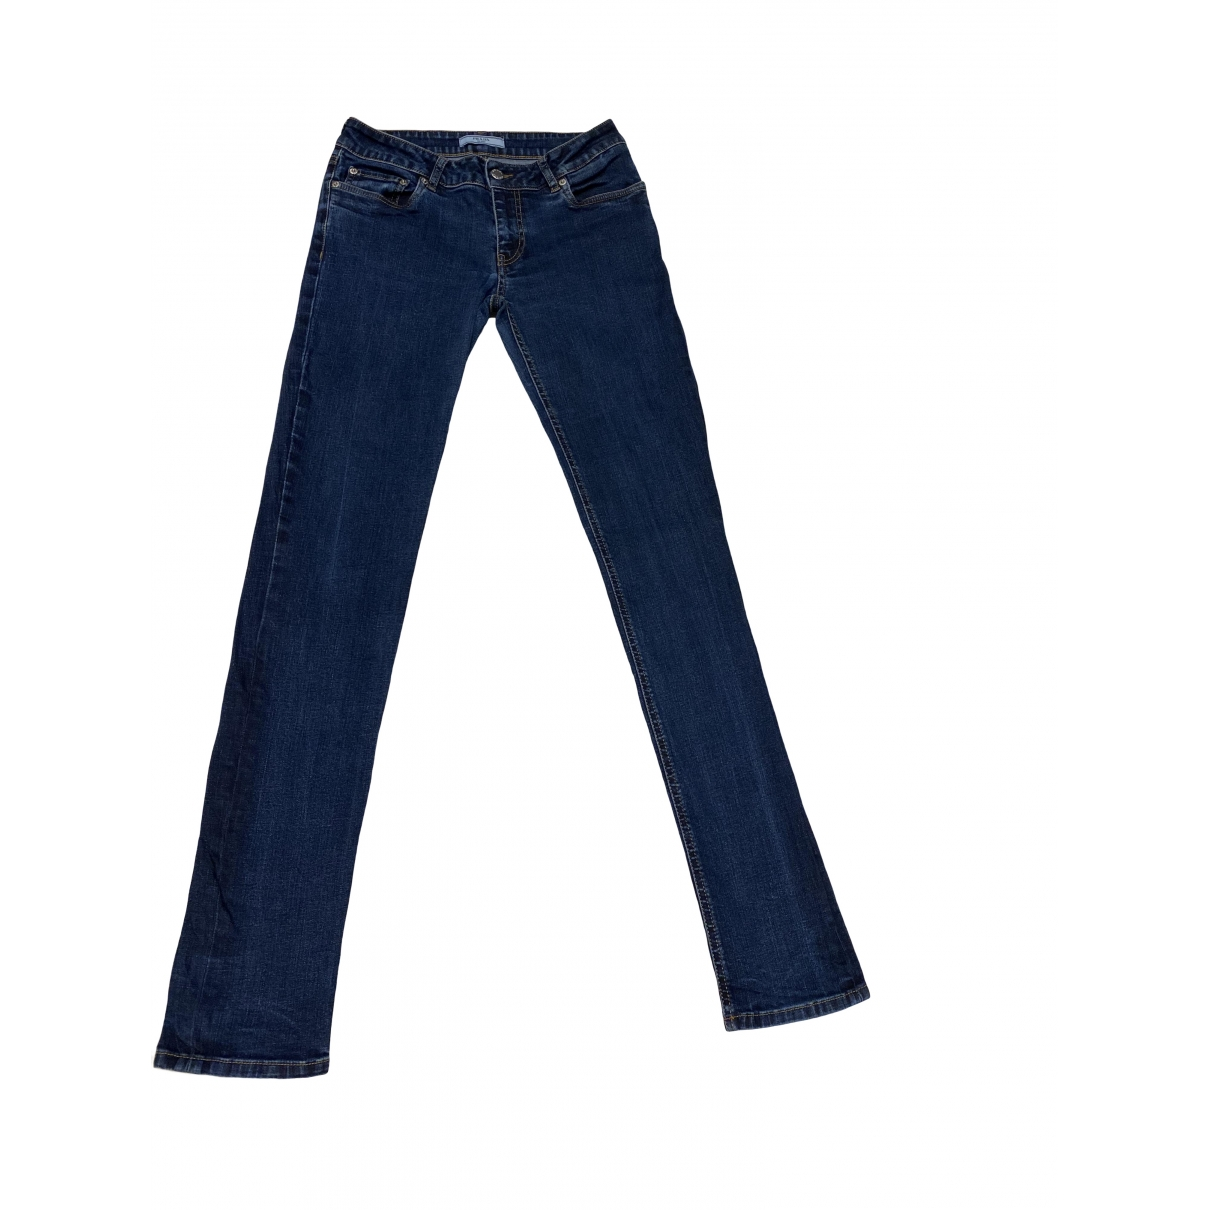 Prada \N Blue Denim - Jeans Jeans for Women 28 US